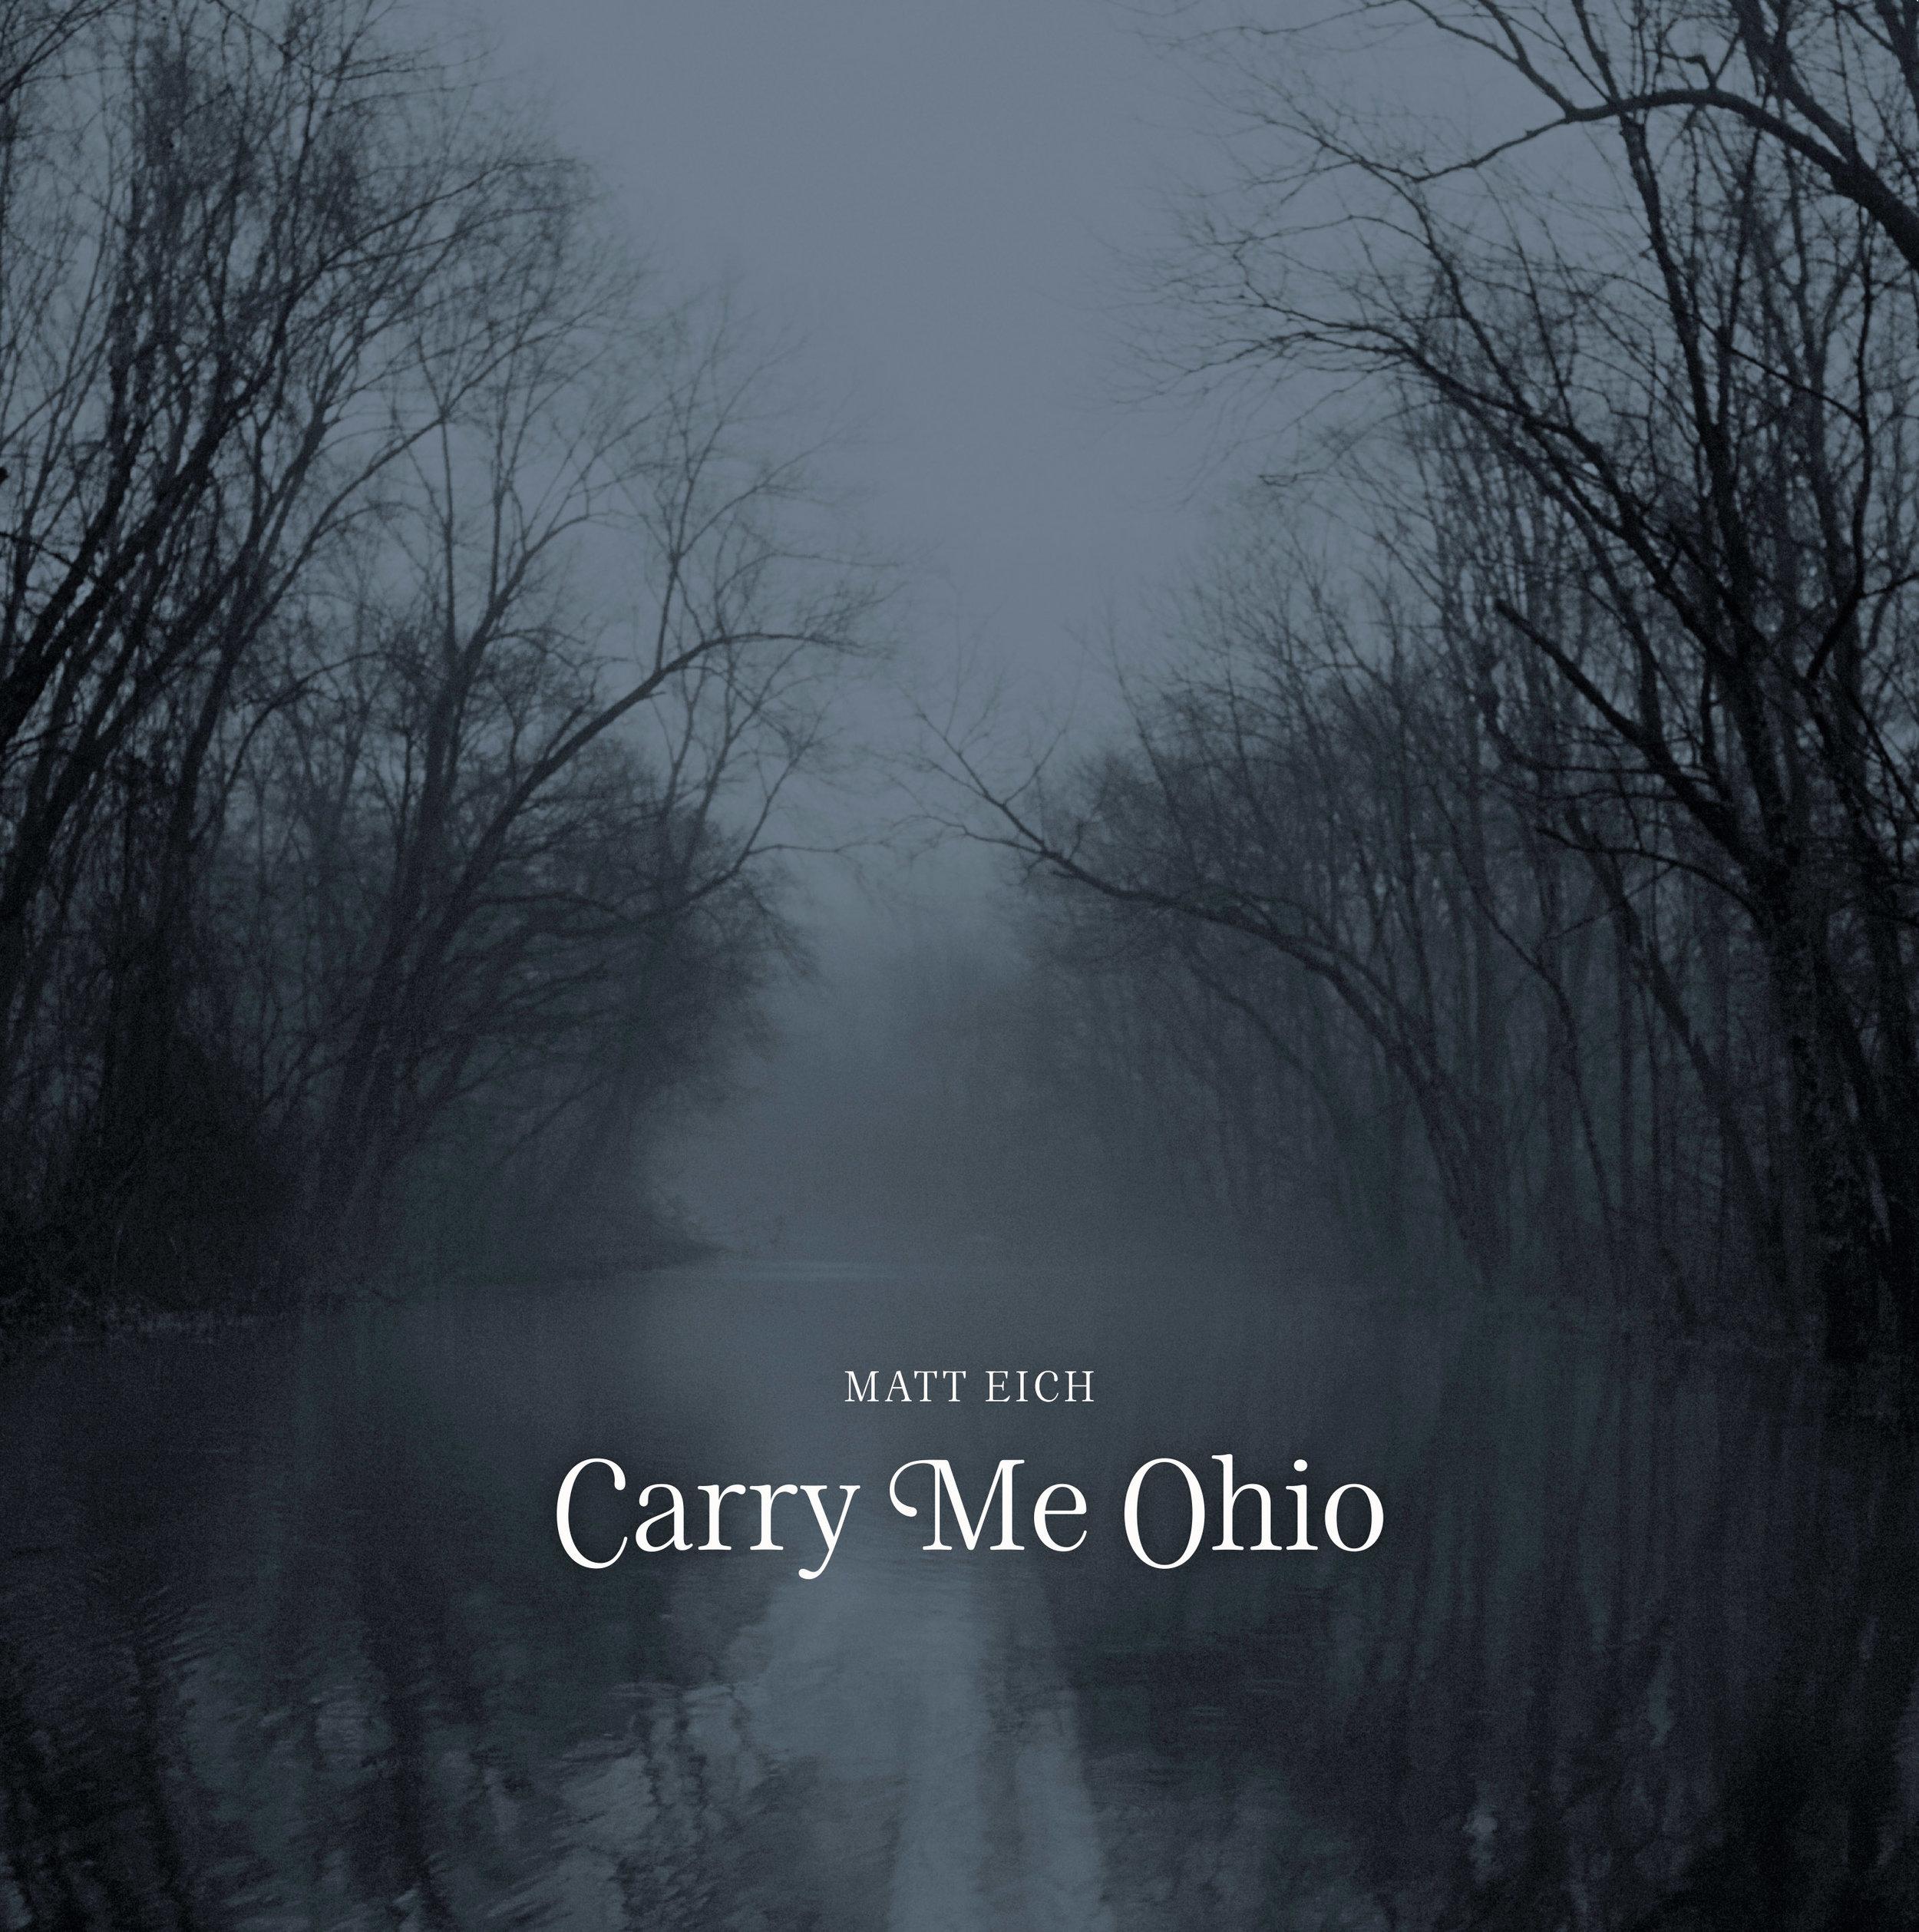 Carry Me Ohio  by Matt Eich. Published 2016.